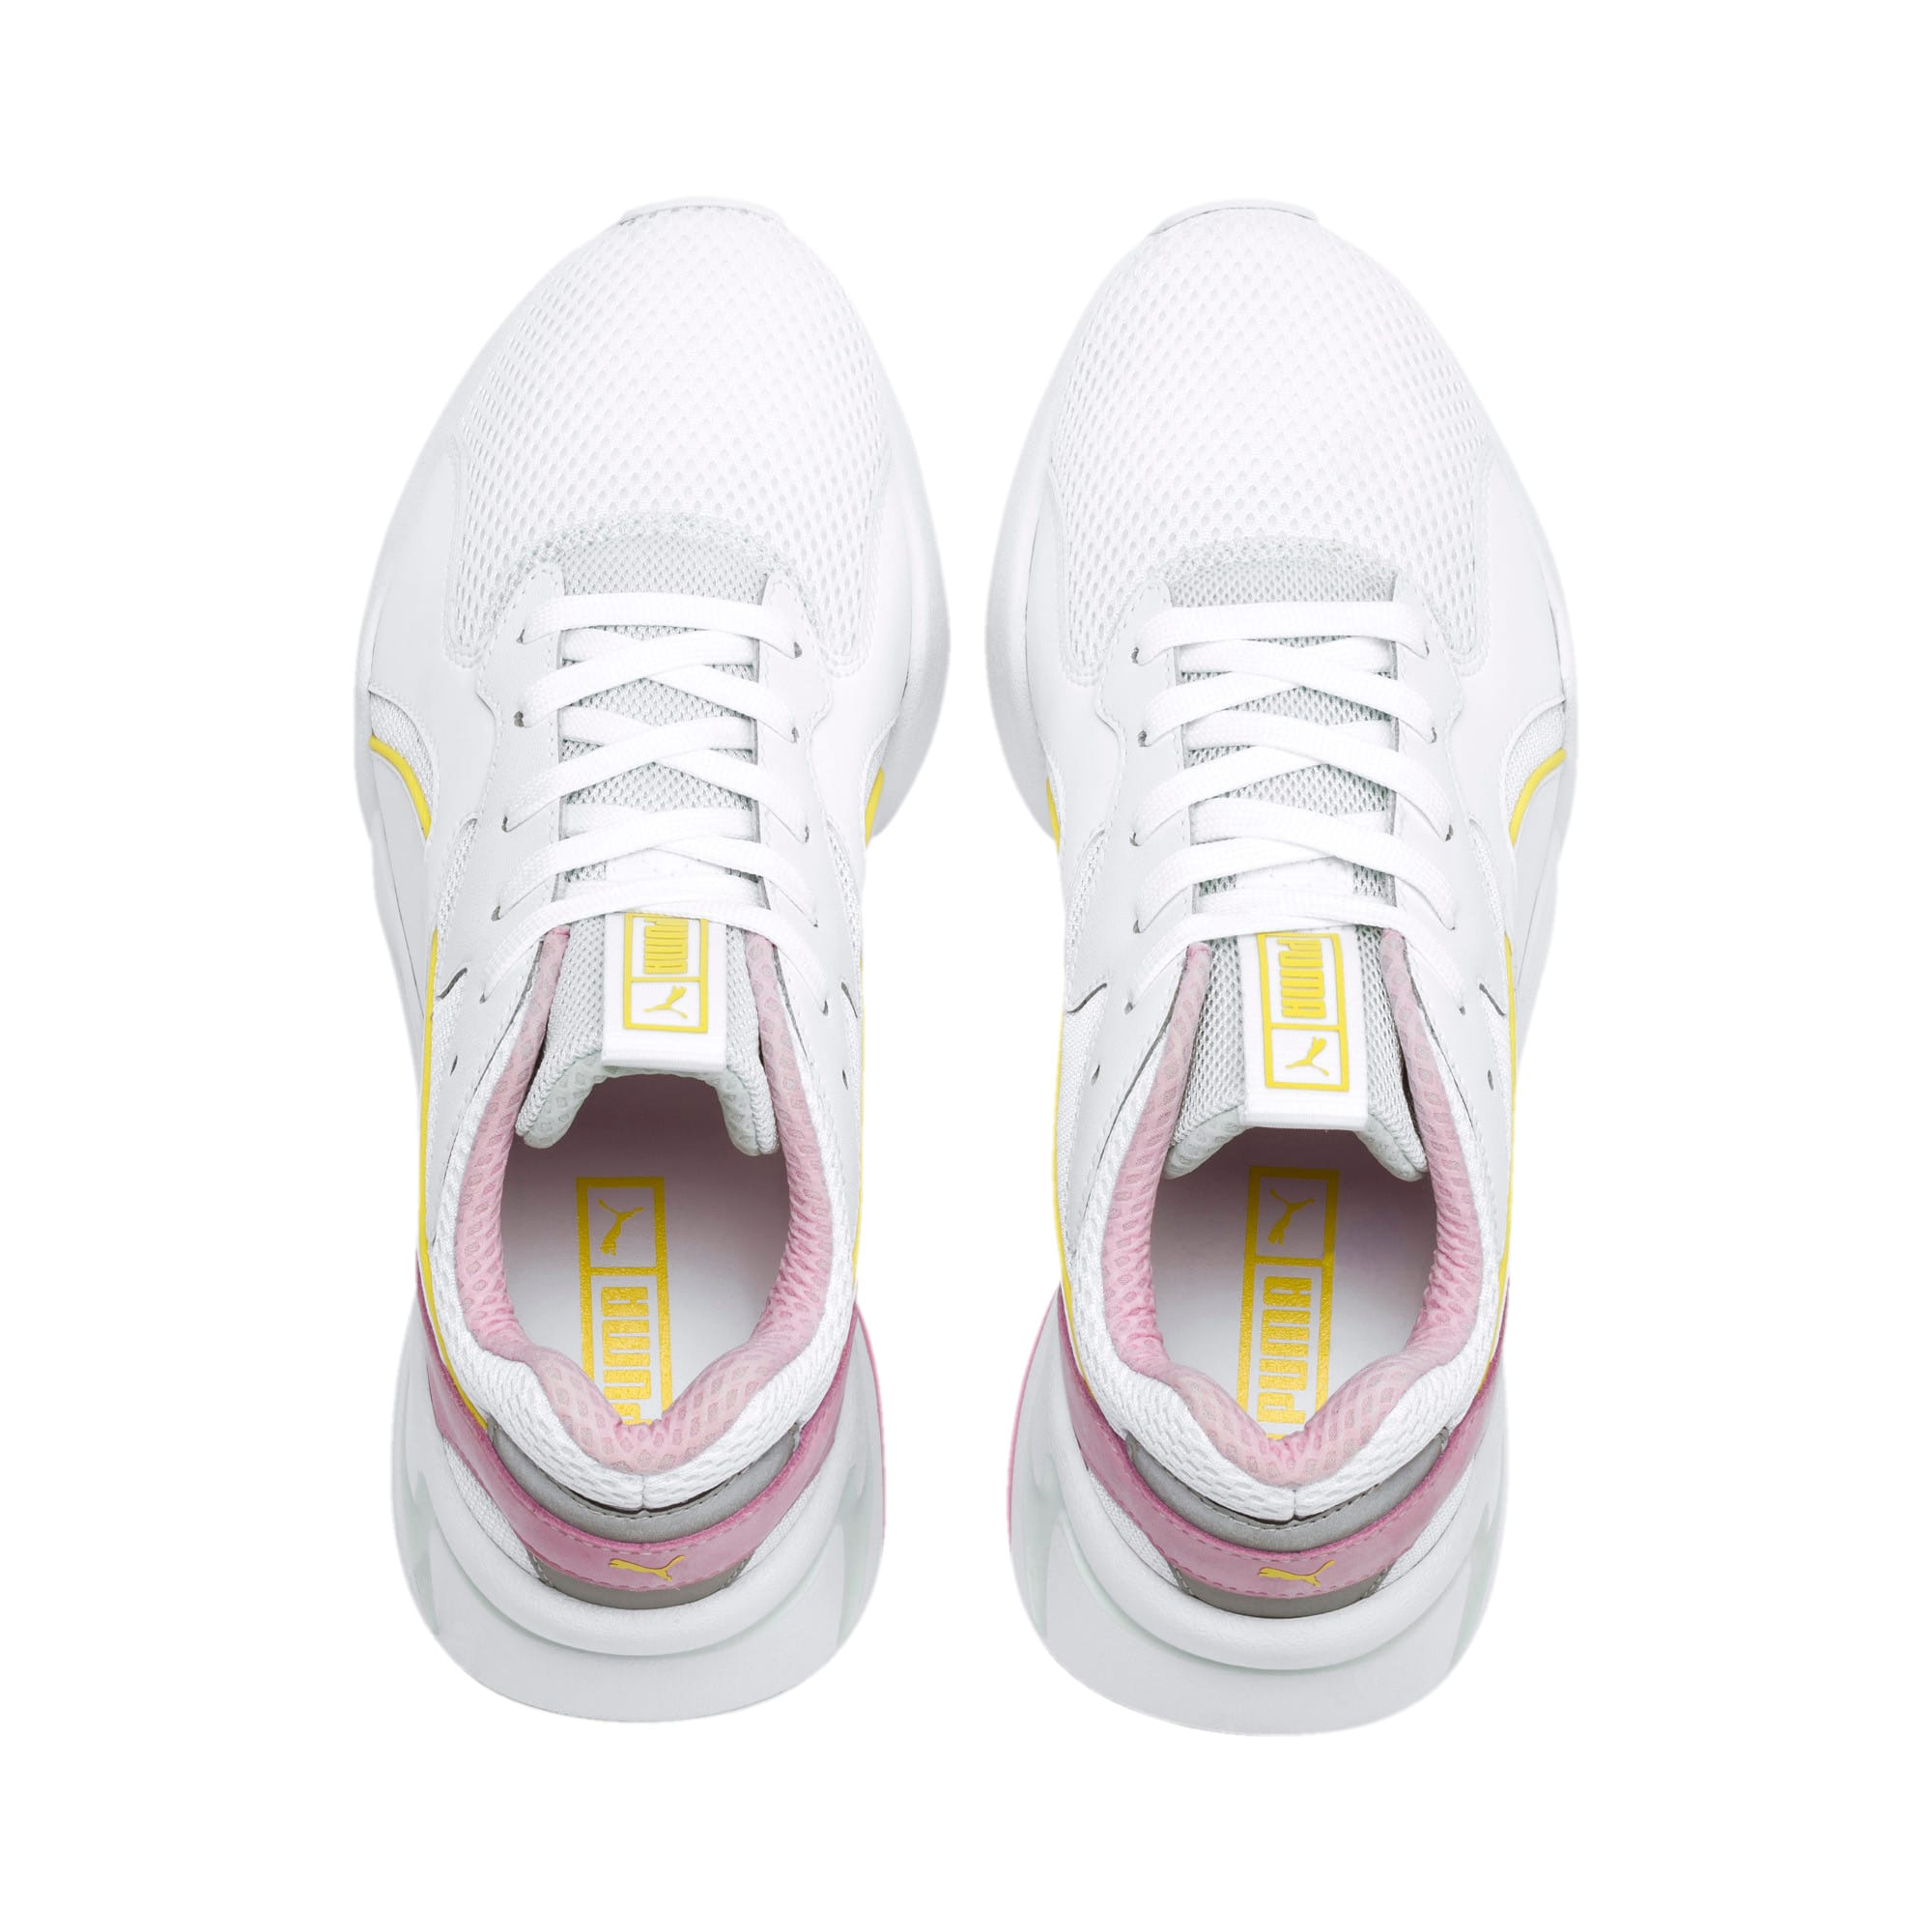 Thumbnail 7 of Nova Mesh Women's Sneakers, Puma White-Fair Aqua, medium